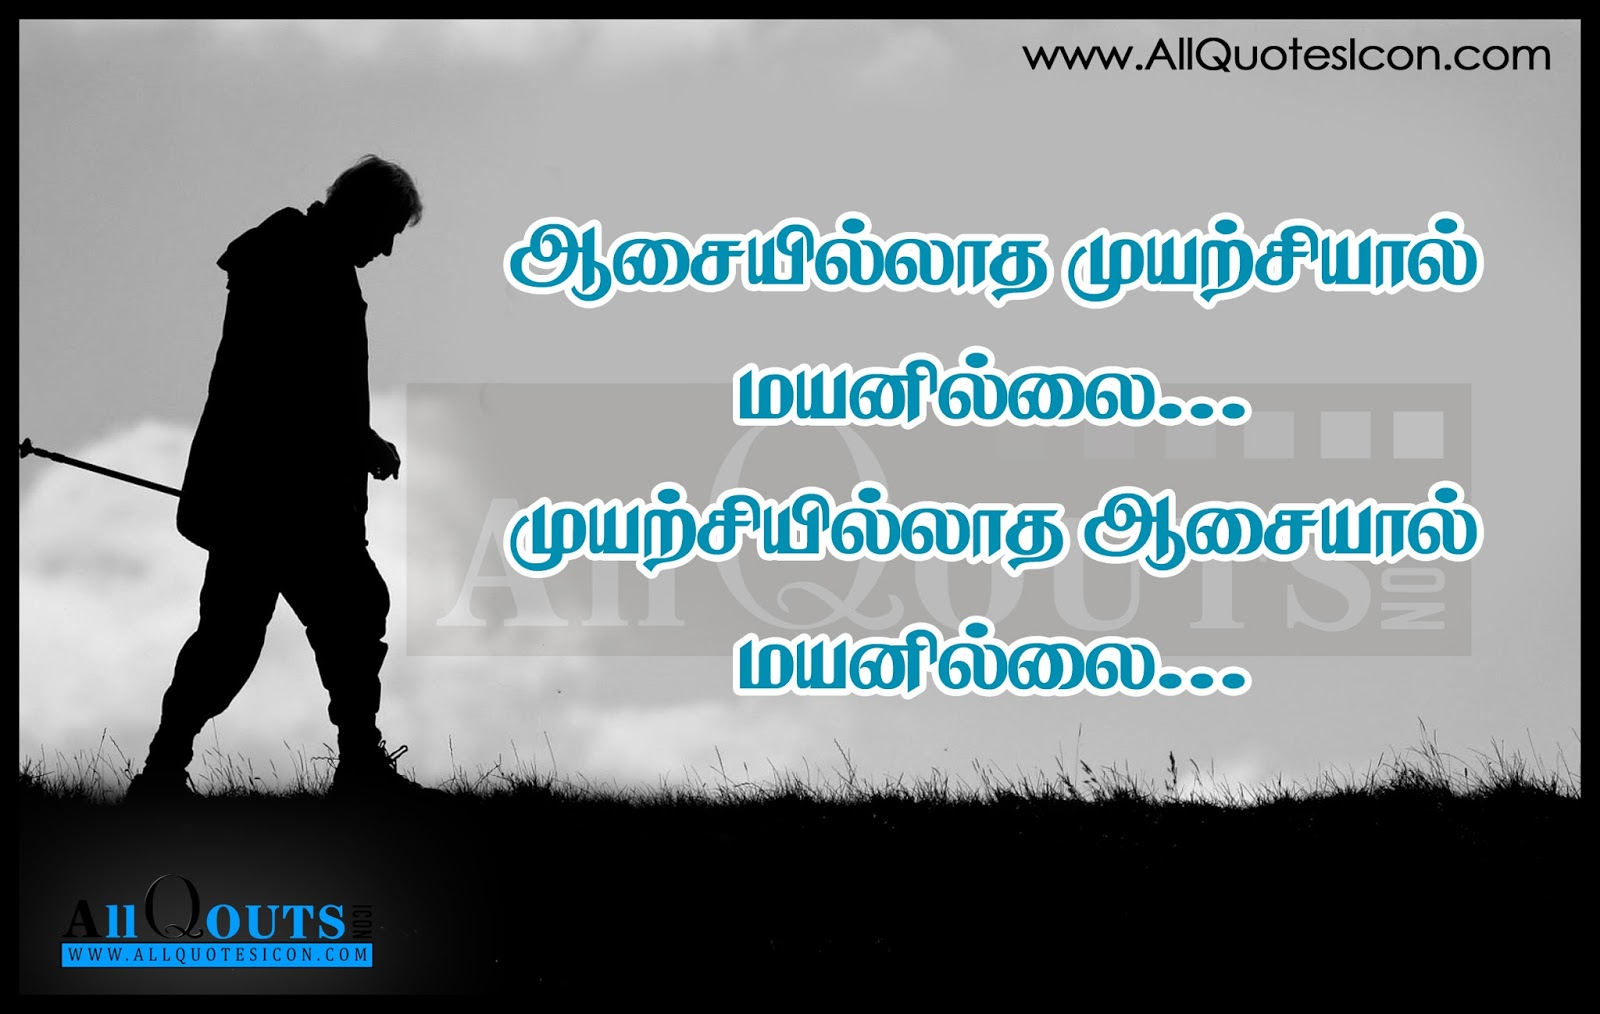 tamil quotes and images telugu